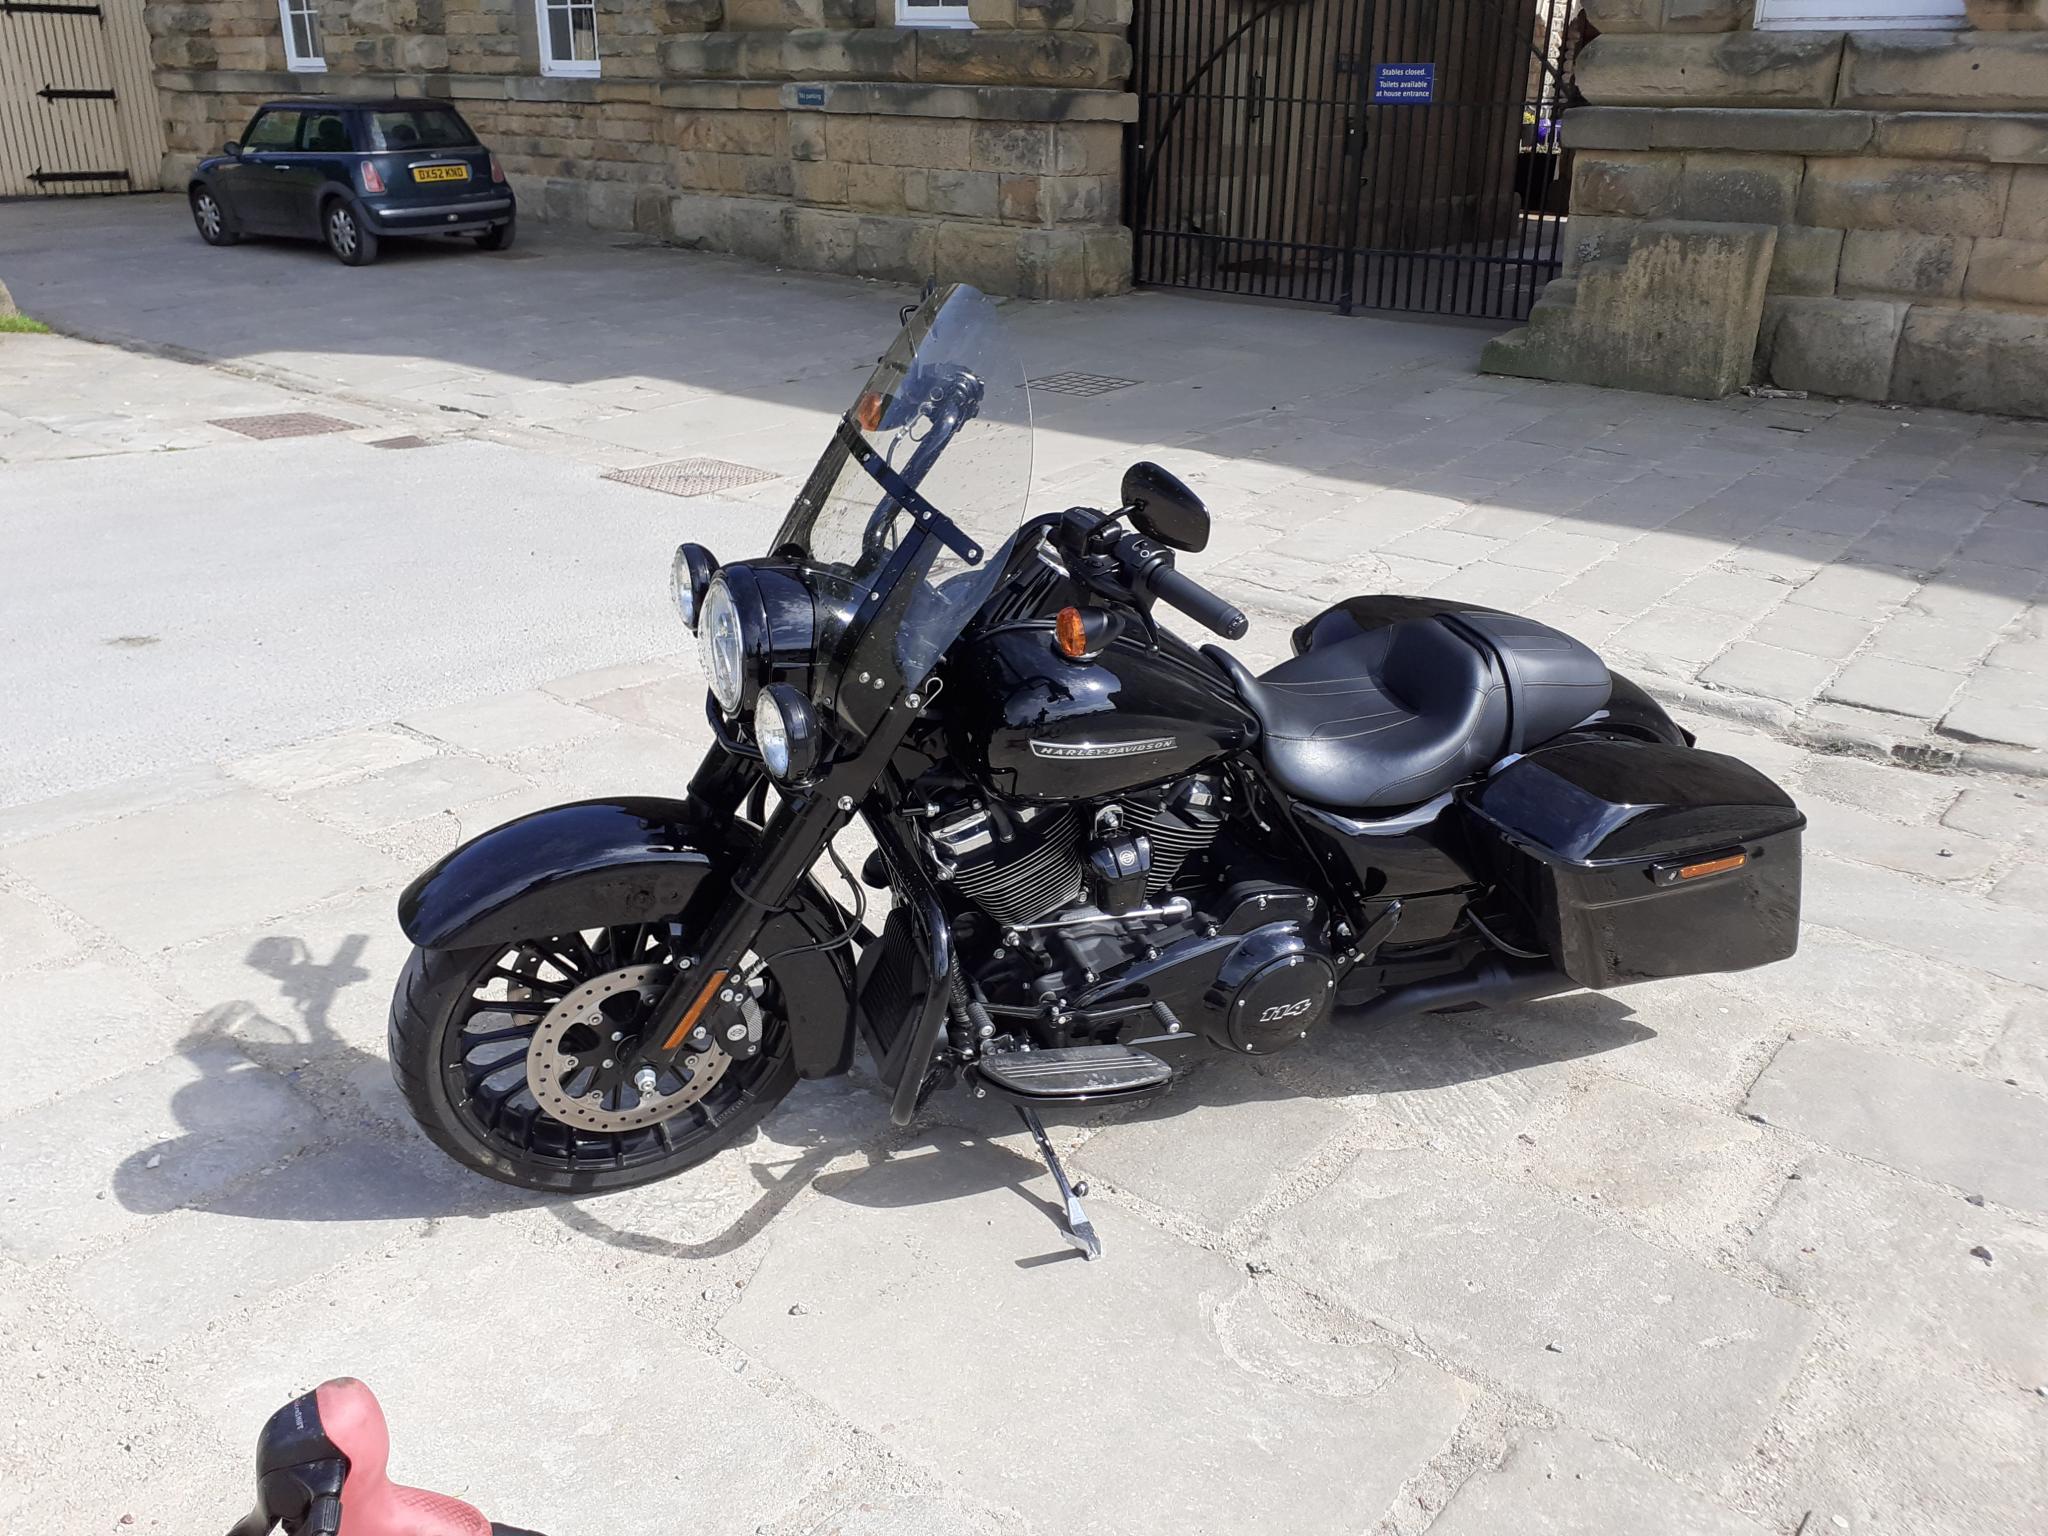 On my bike-20200527_160147-jpg